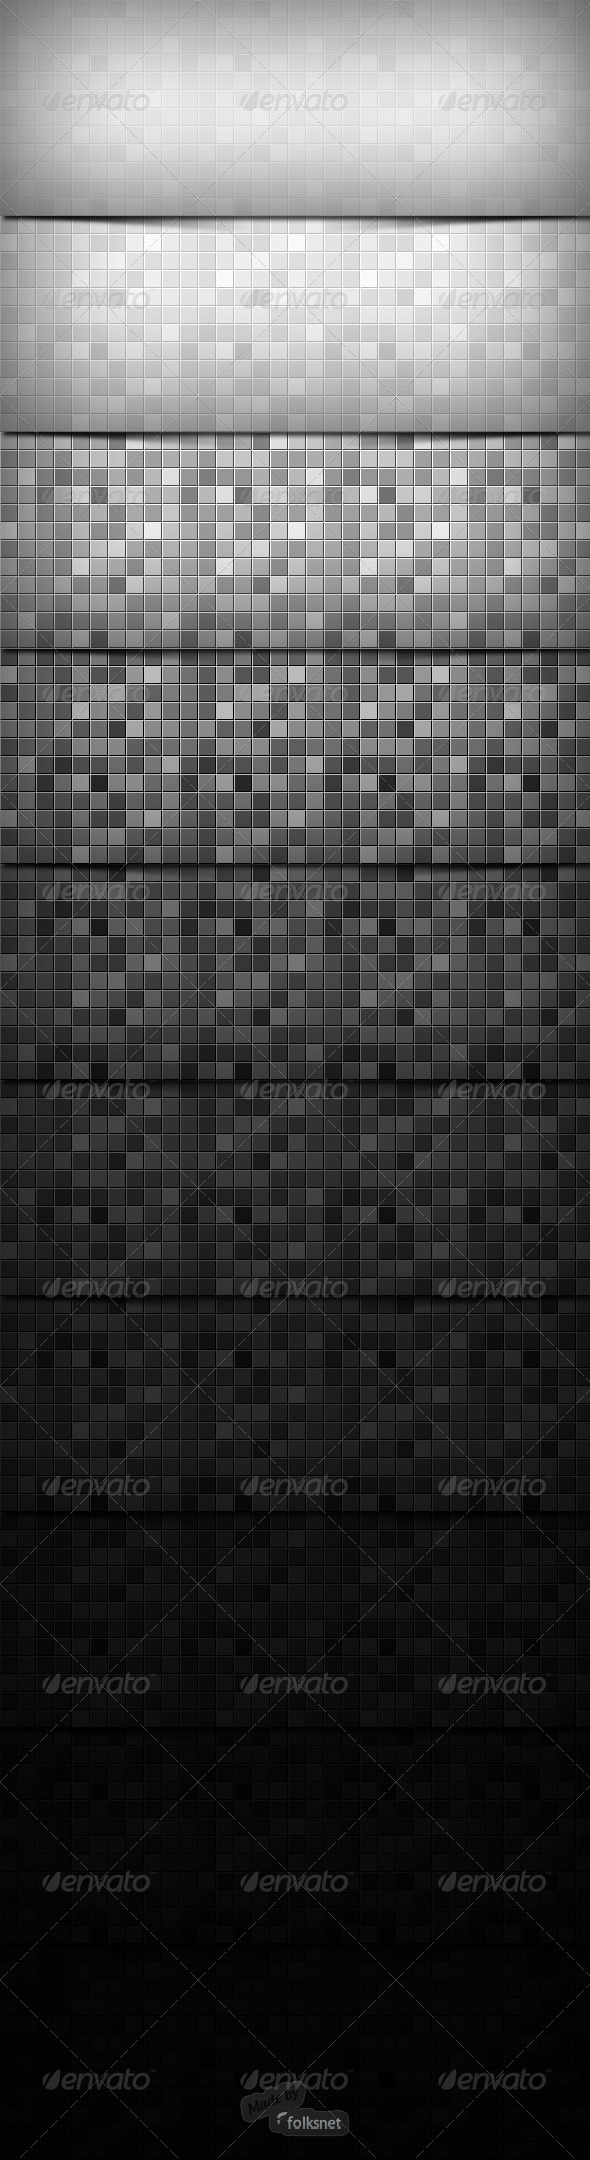 GraphicRiver Mozaic Textures 2.0 1375282